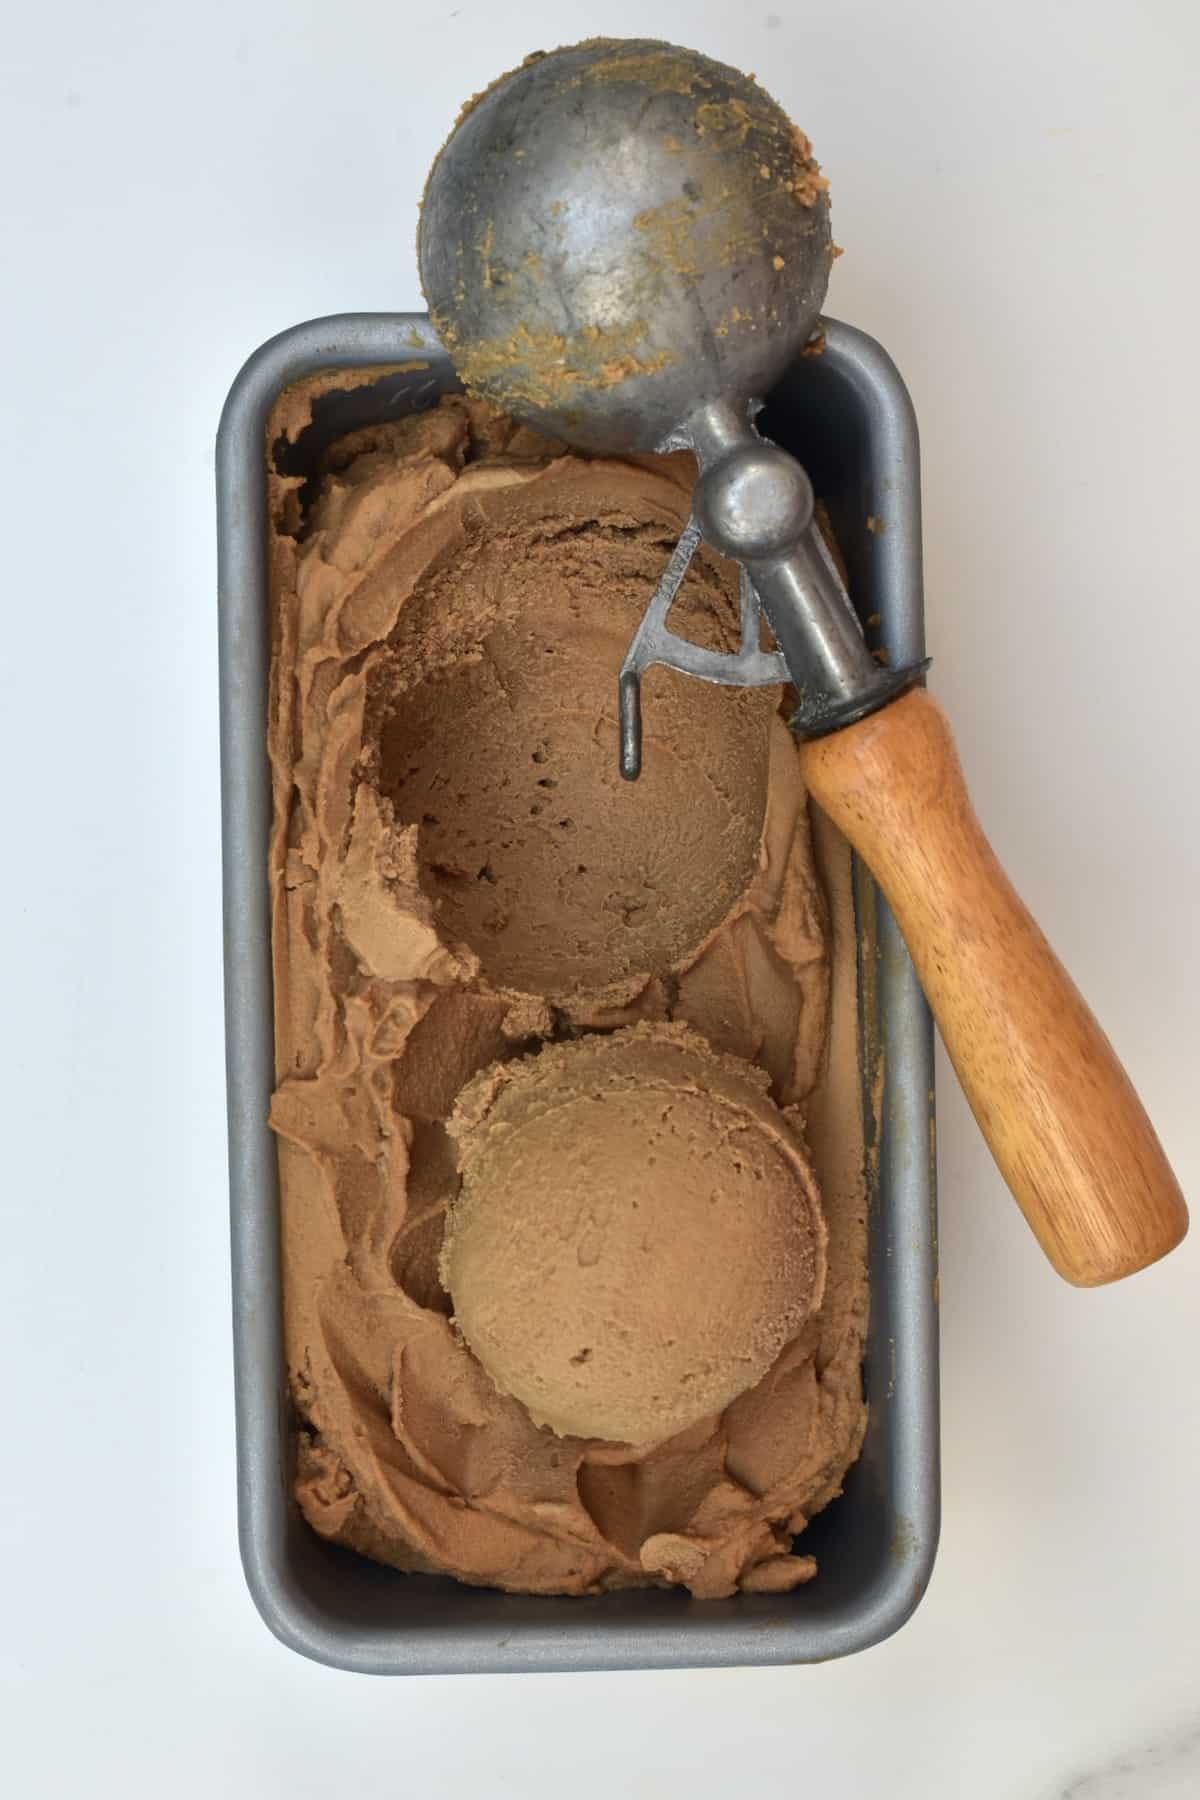 A scooper and coffee ice cream